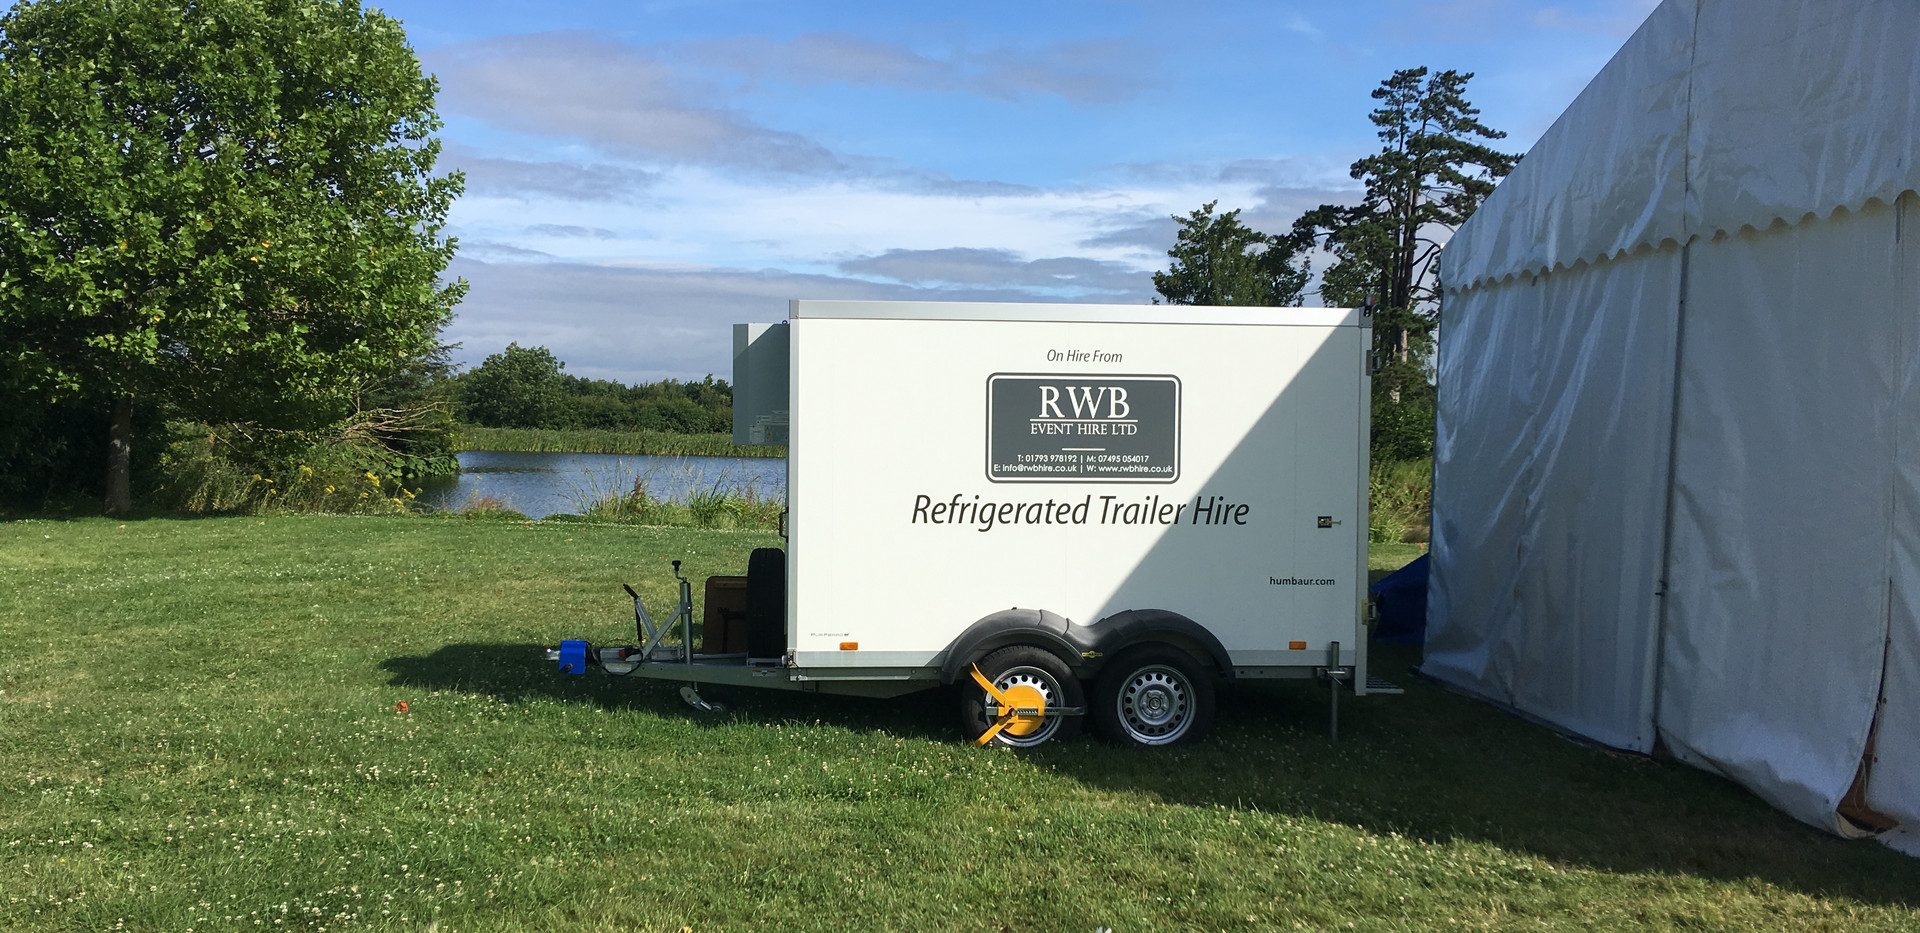 rwb food fridge trailer hire.jpeg